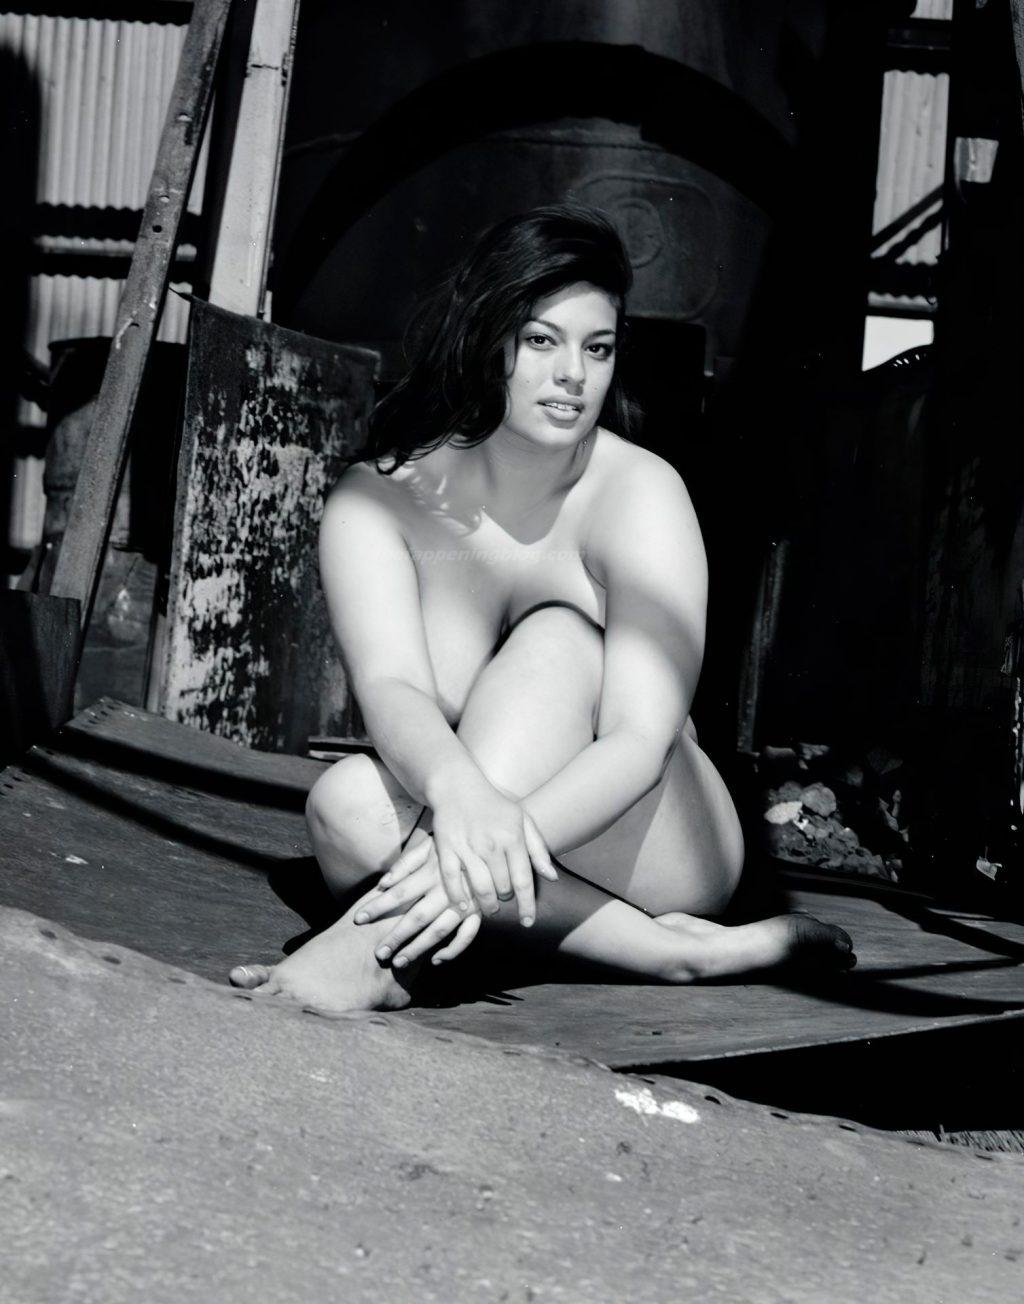 Ashley Graham Nude Leaked The Fappening (38 Photos)